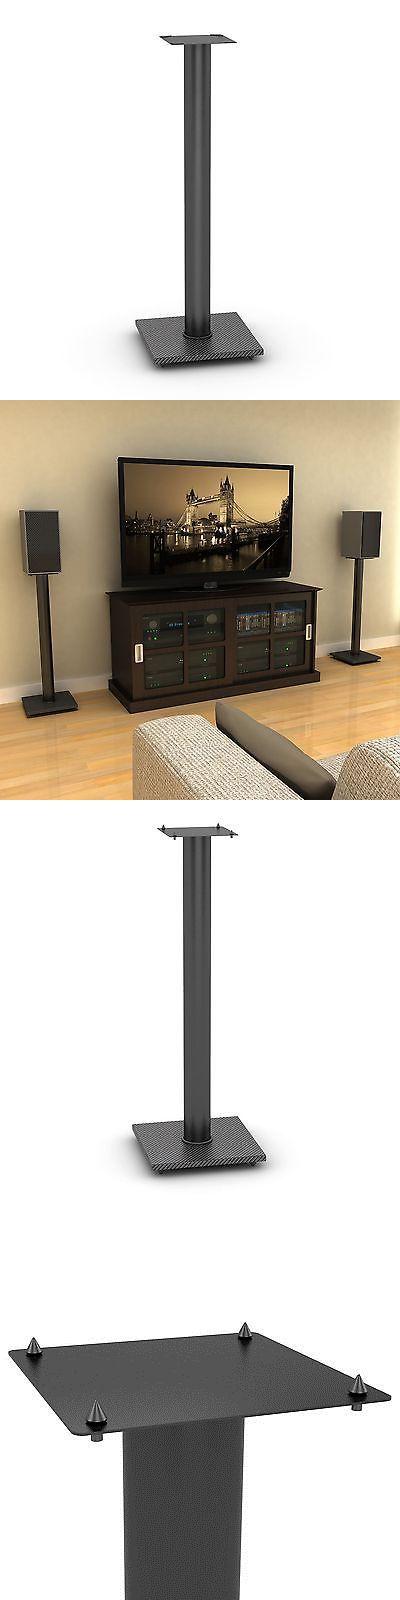 Speaker Mounts and Stands: Atlantic Adjustable Bookshelf Speaker Stand (Set Of 2) New BUY IT NOW ONLY: $62.88